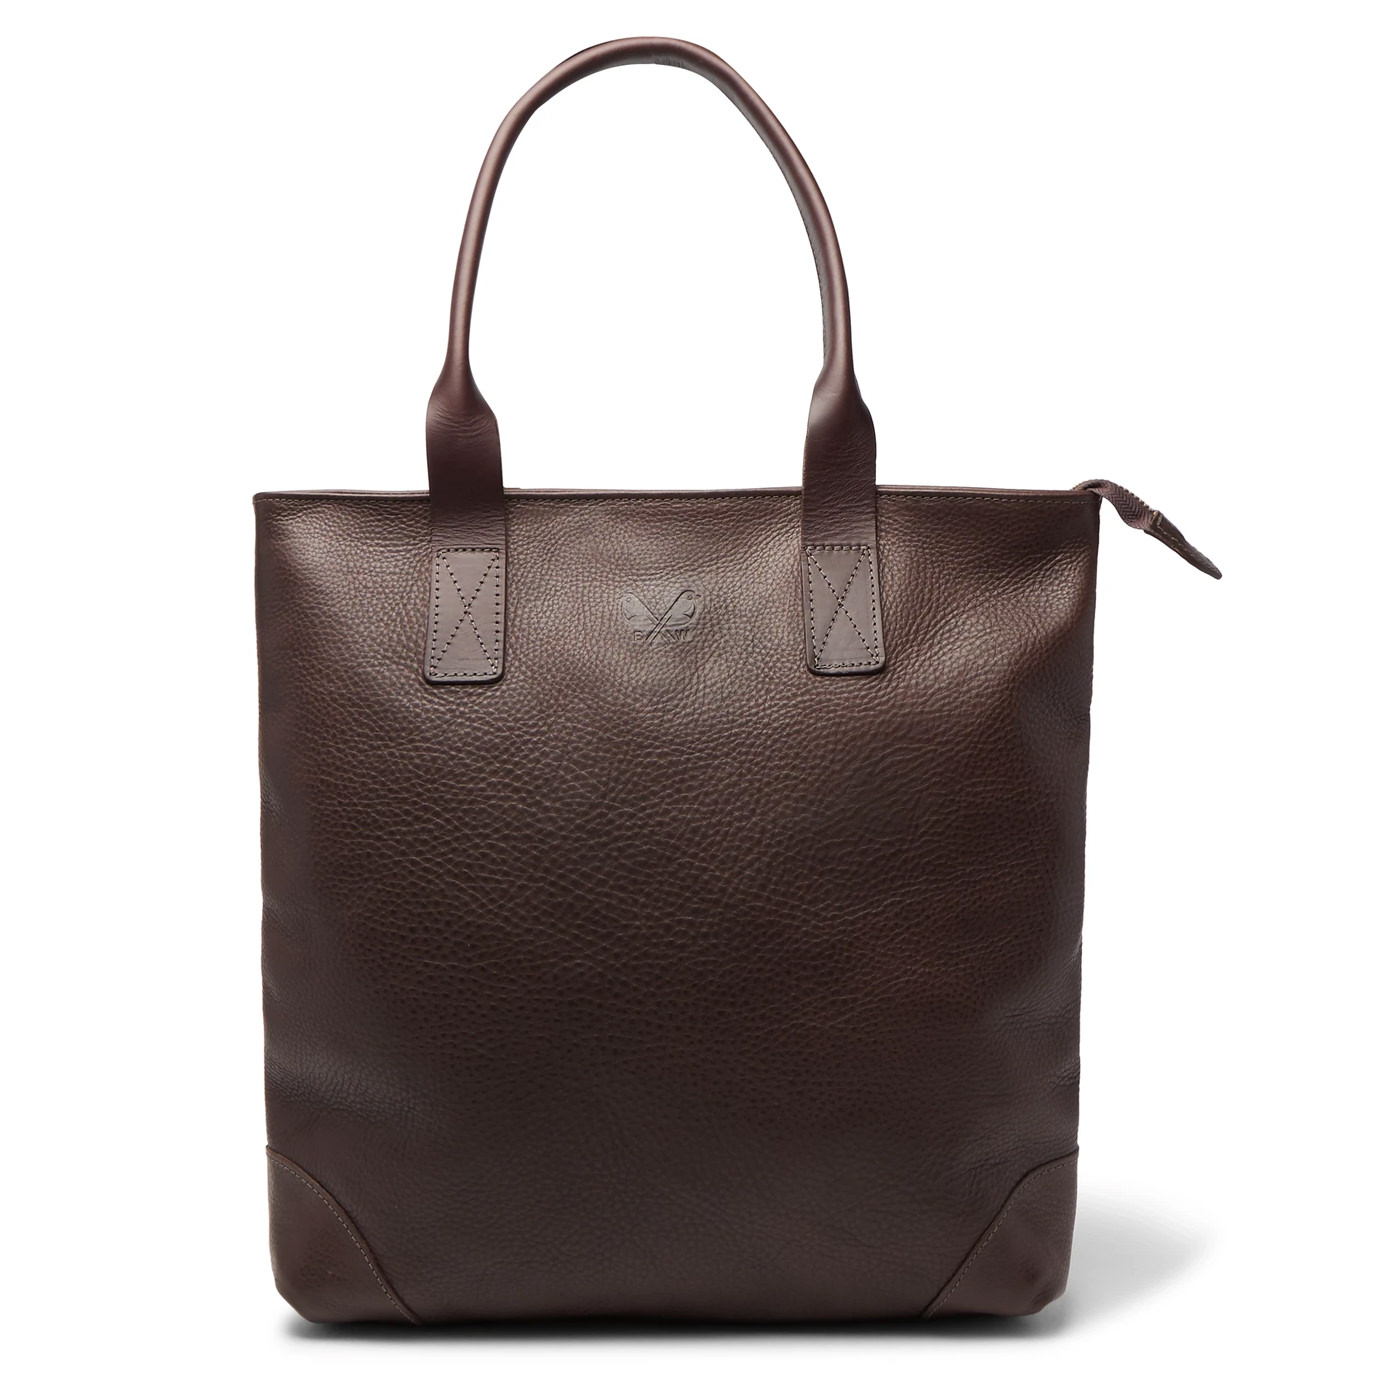 Style Mr Porter Tote Bag Bennett Winch Cuir Marron